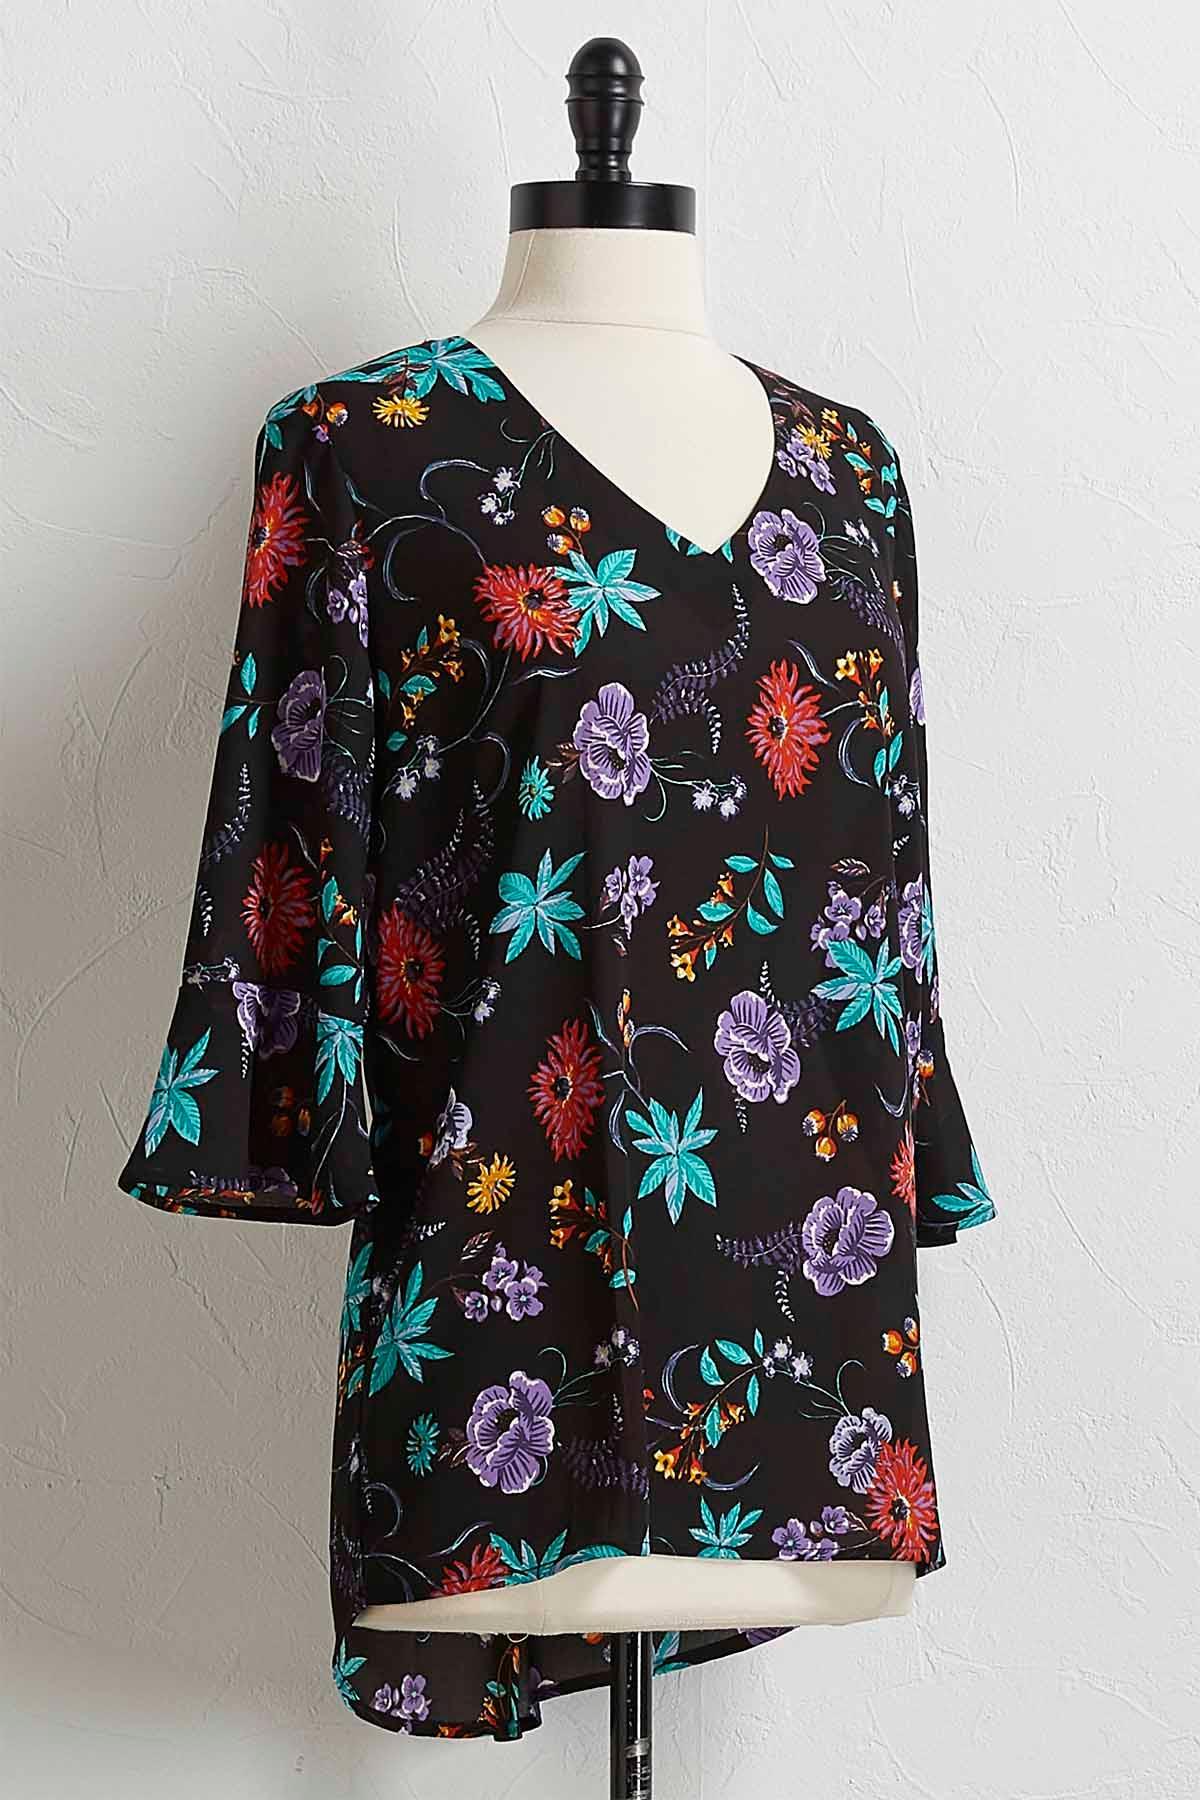 Vine Floral Bell Sleeve Top